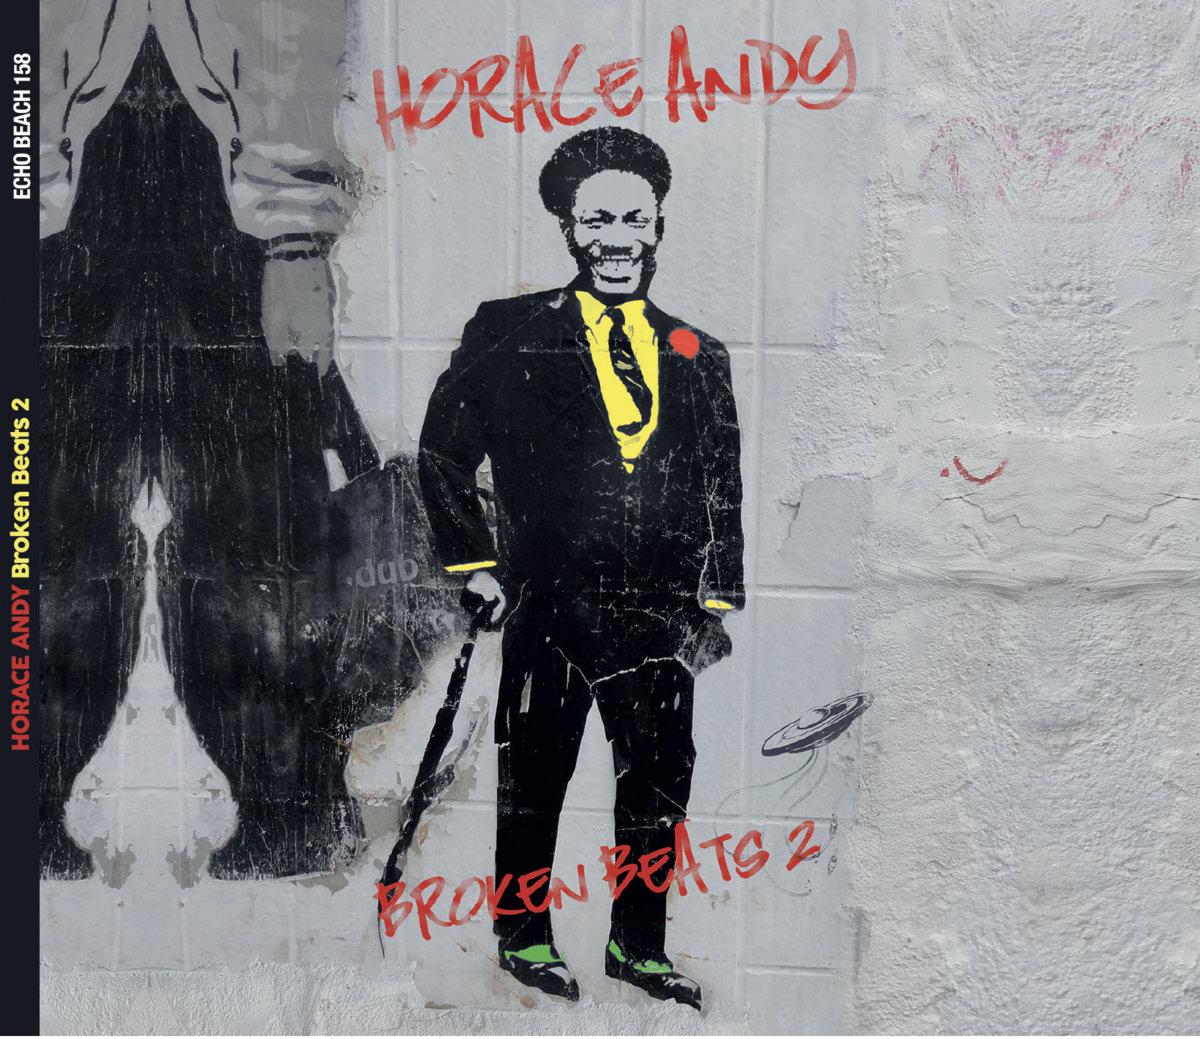 Horace Andy - Skylarking (Noiseshaper Version)